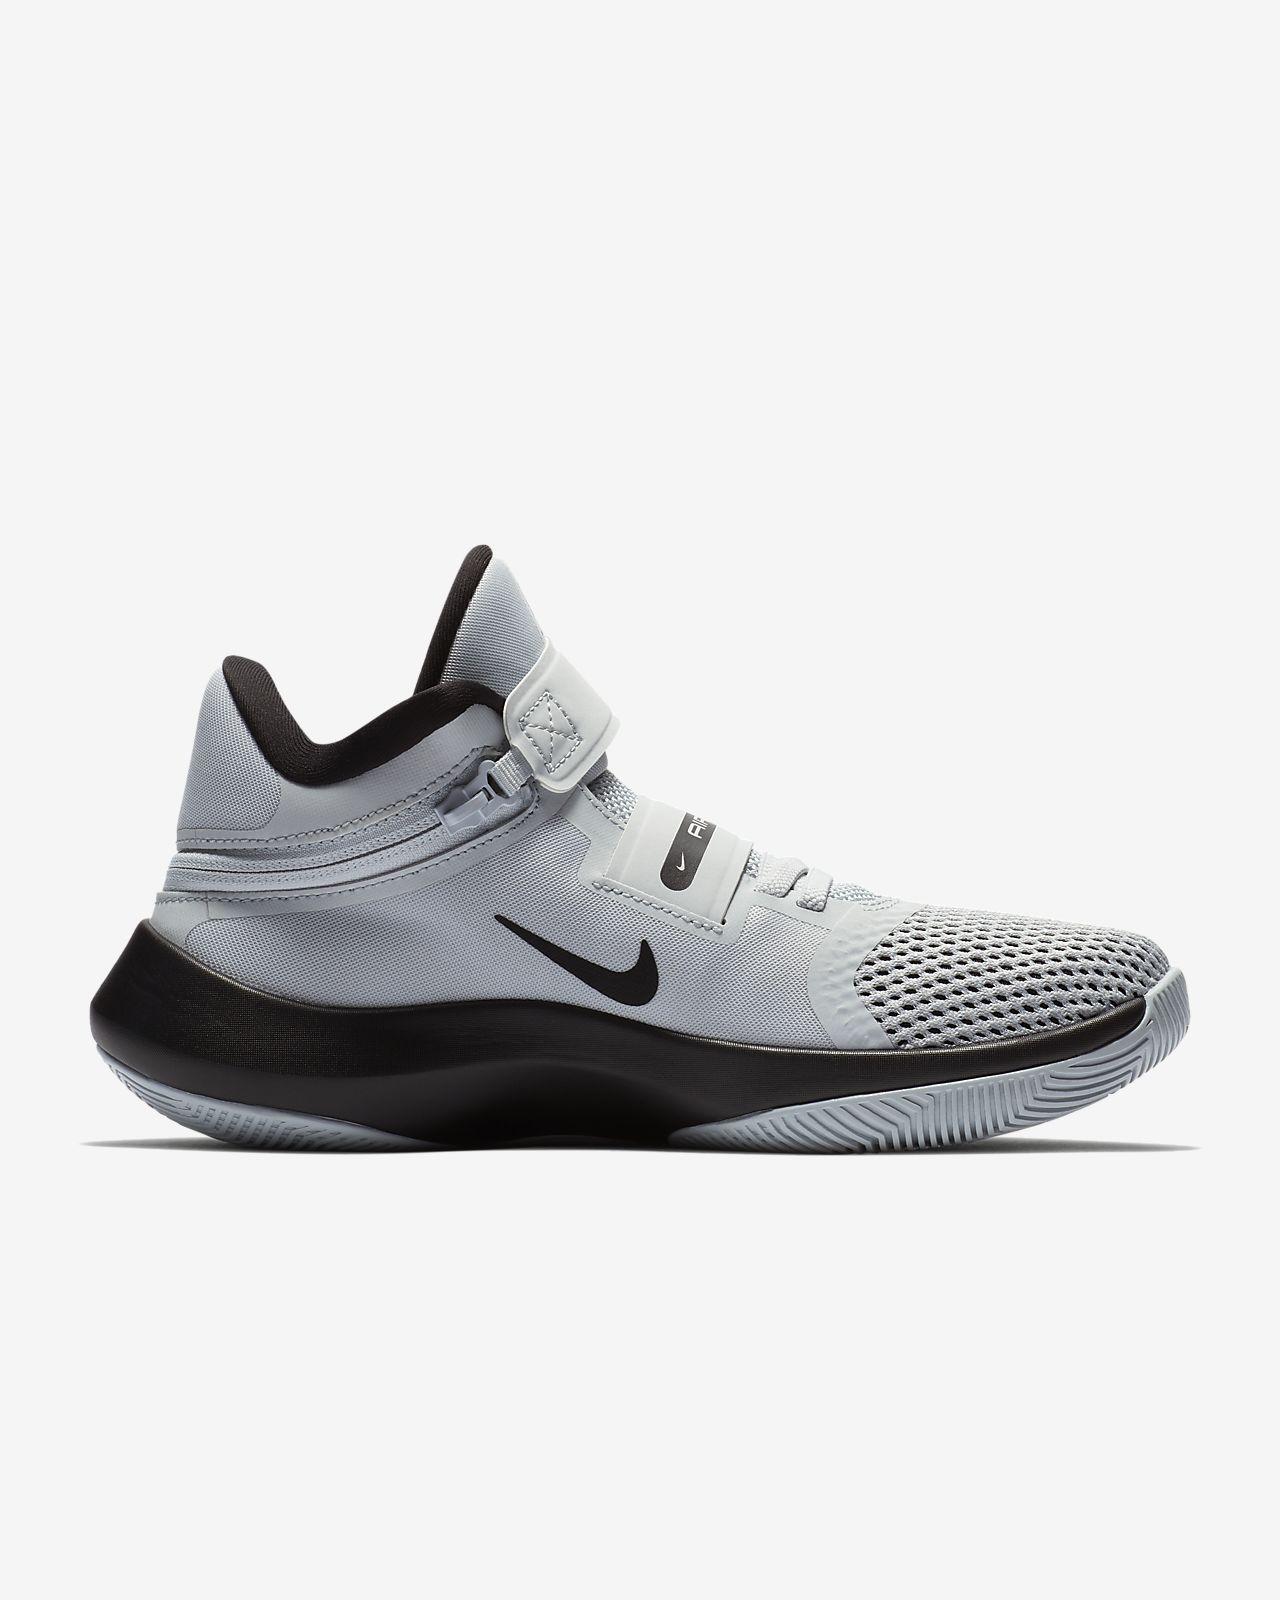 timeless design 6c28a c225a Nike Air Precision II FlyEase Women's Basketball Shoe. Nike.com